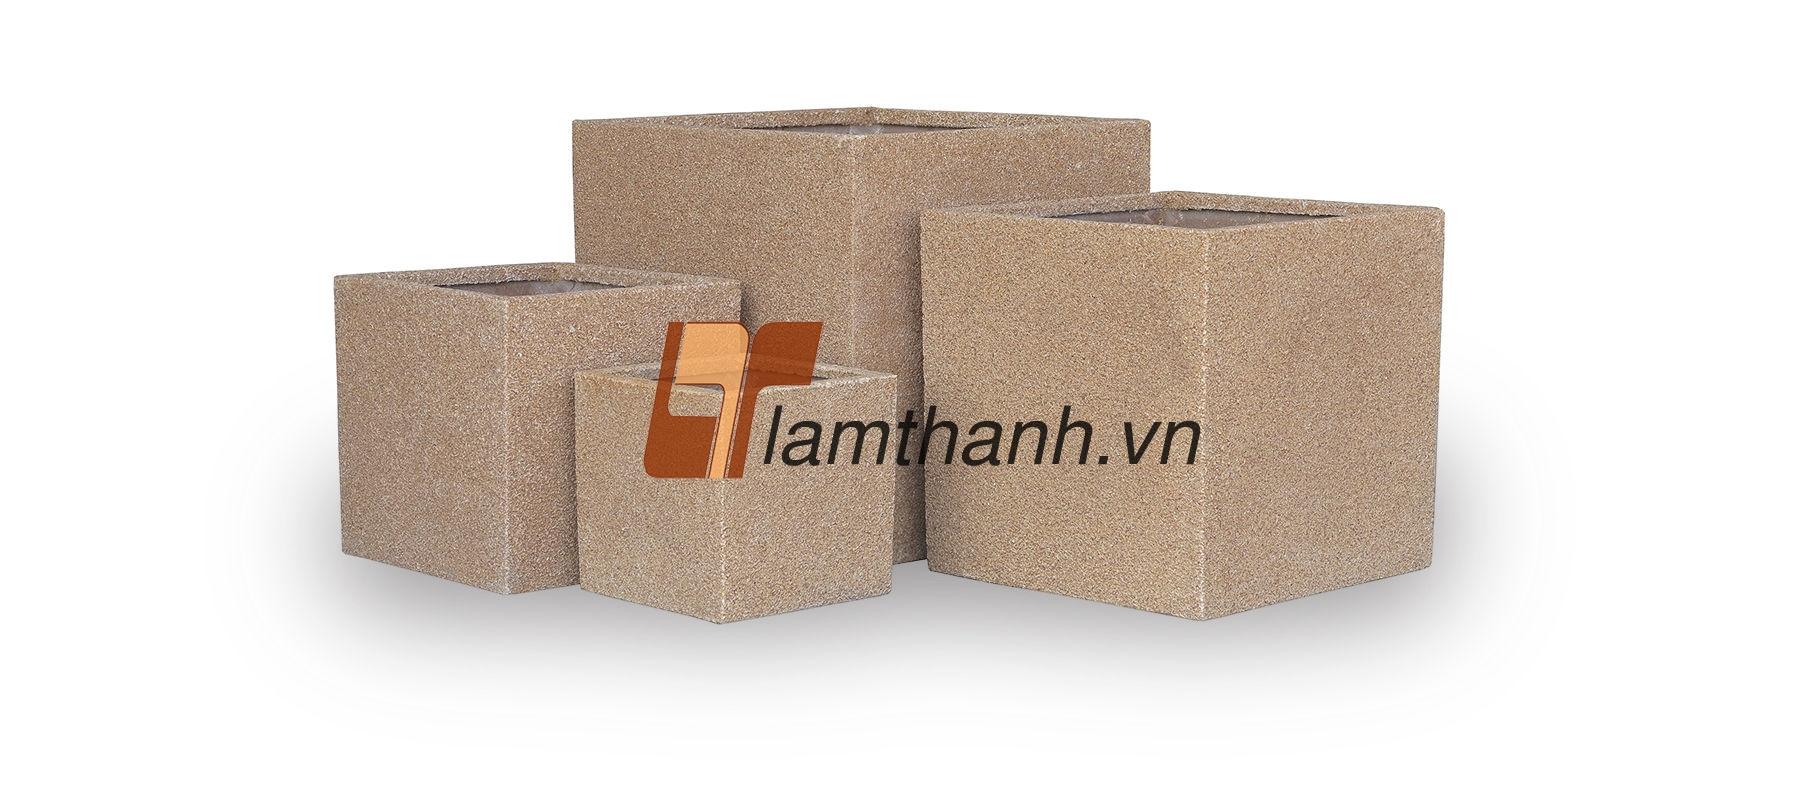 vietnam polystone, fiberglass 04